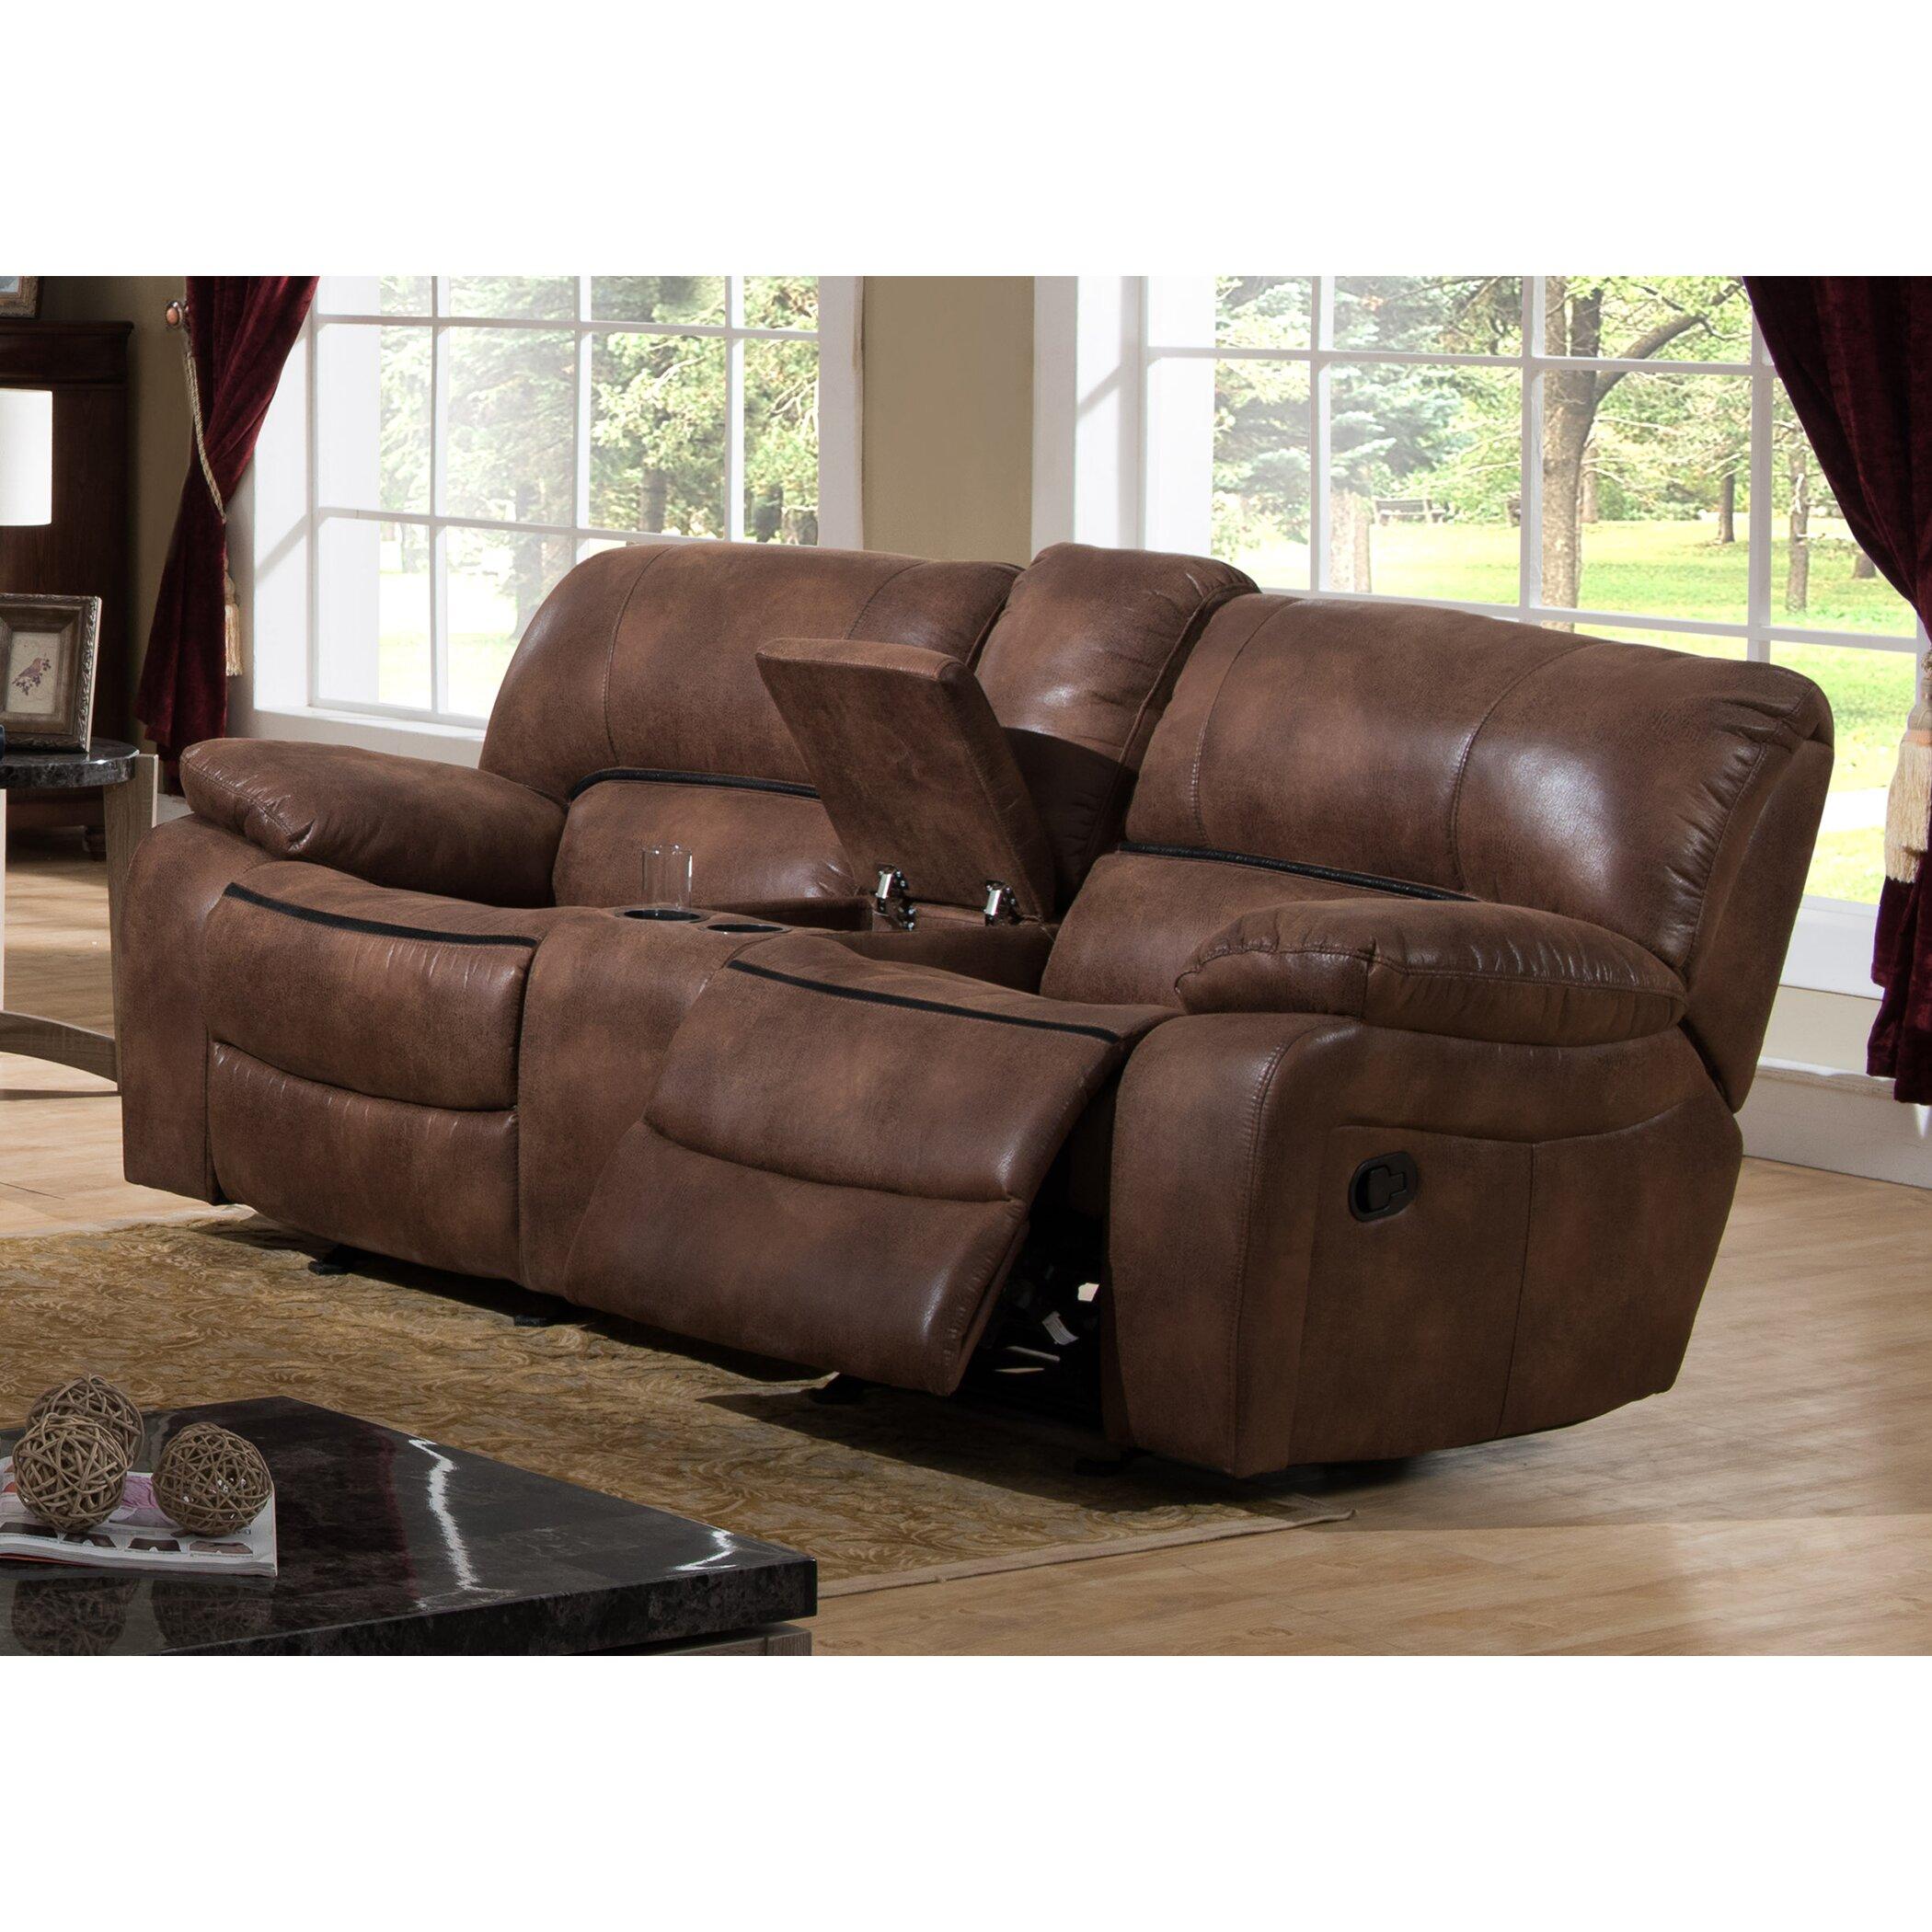 ac pacific leighton 2 piece reclining living room set